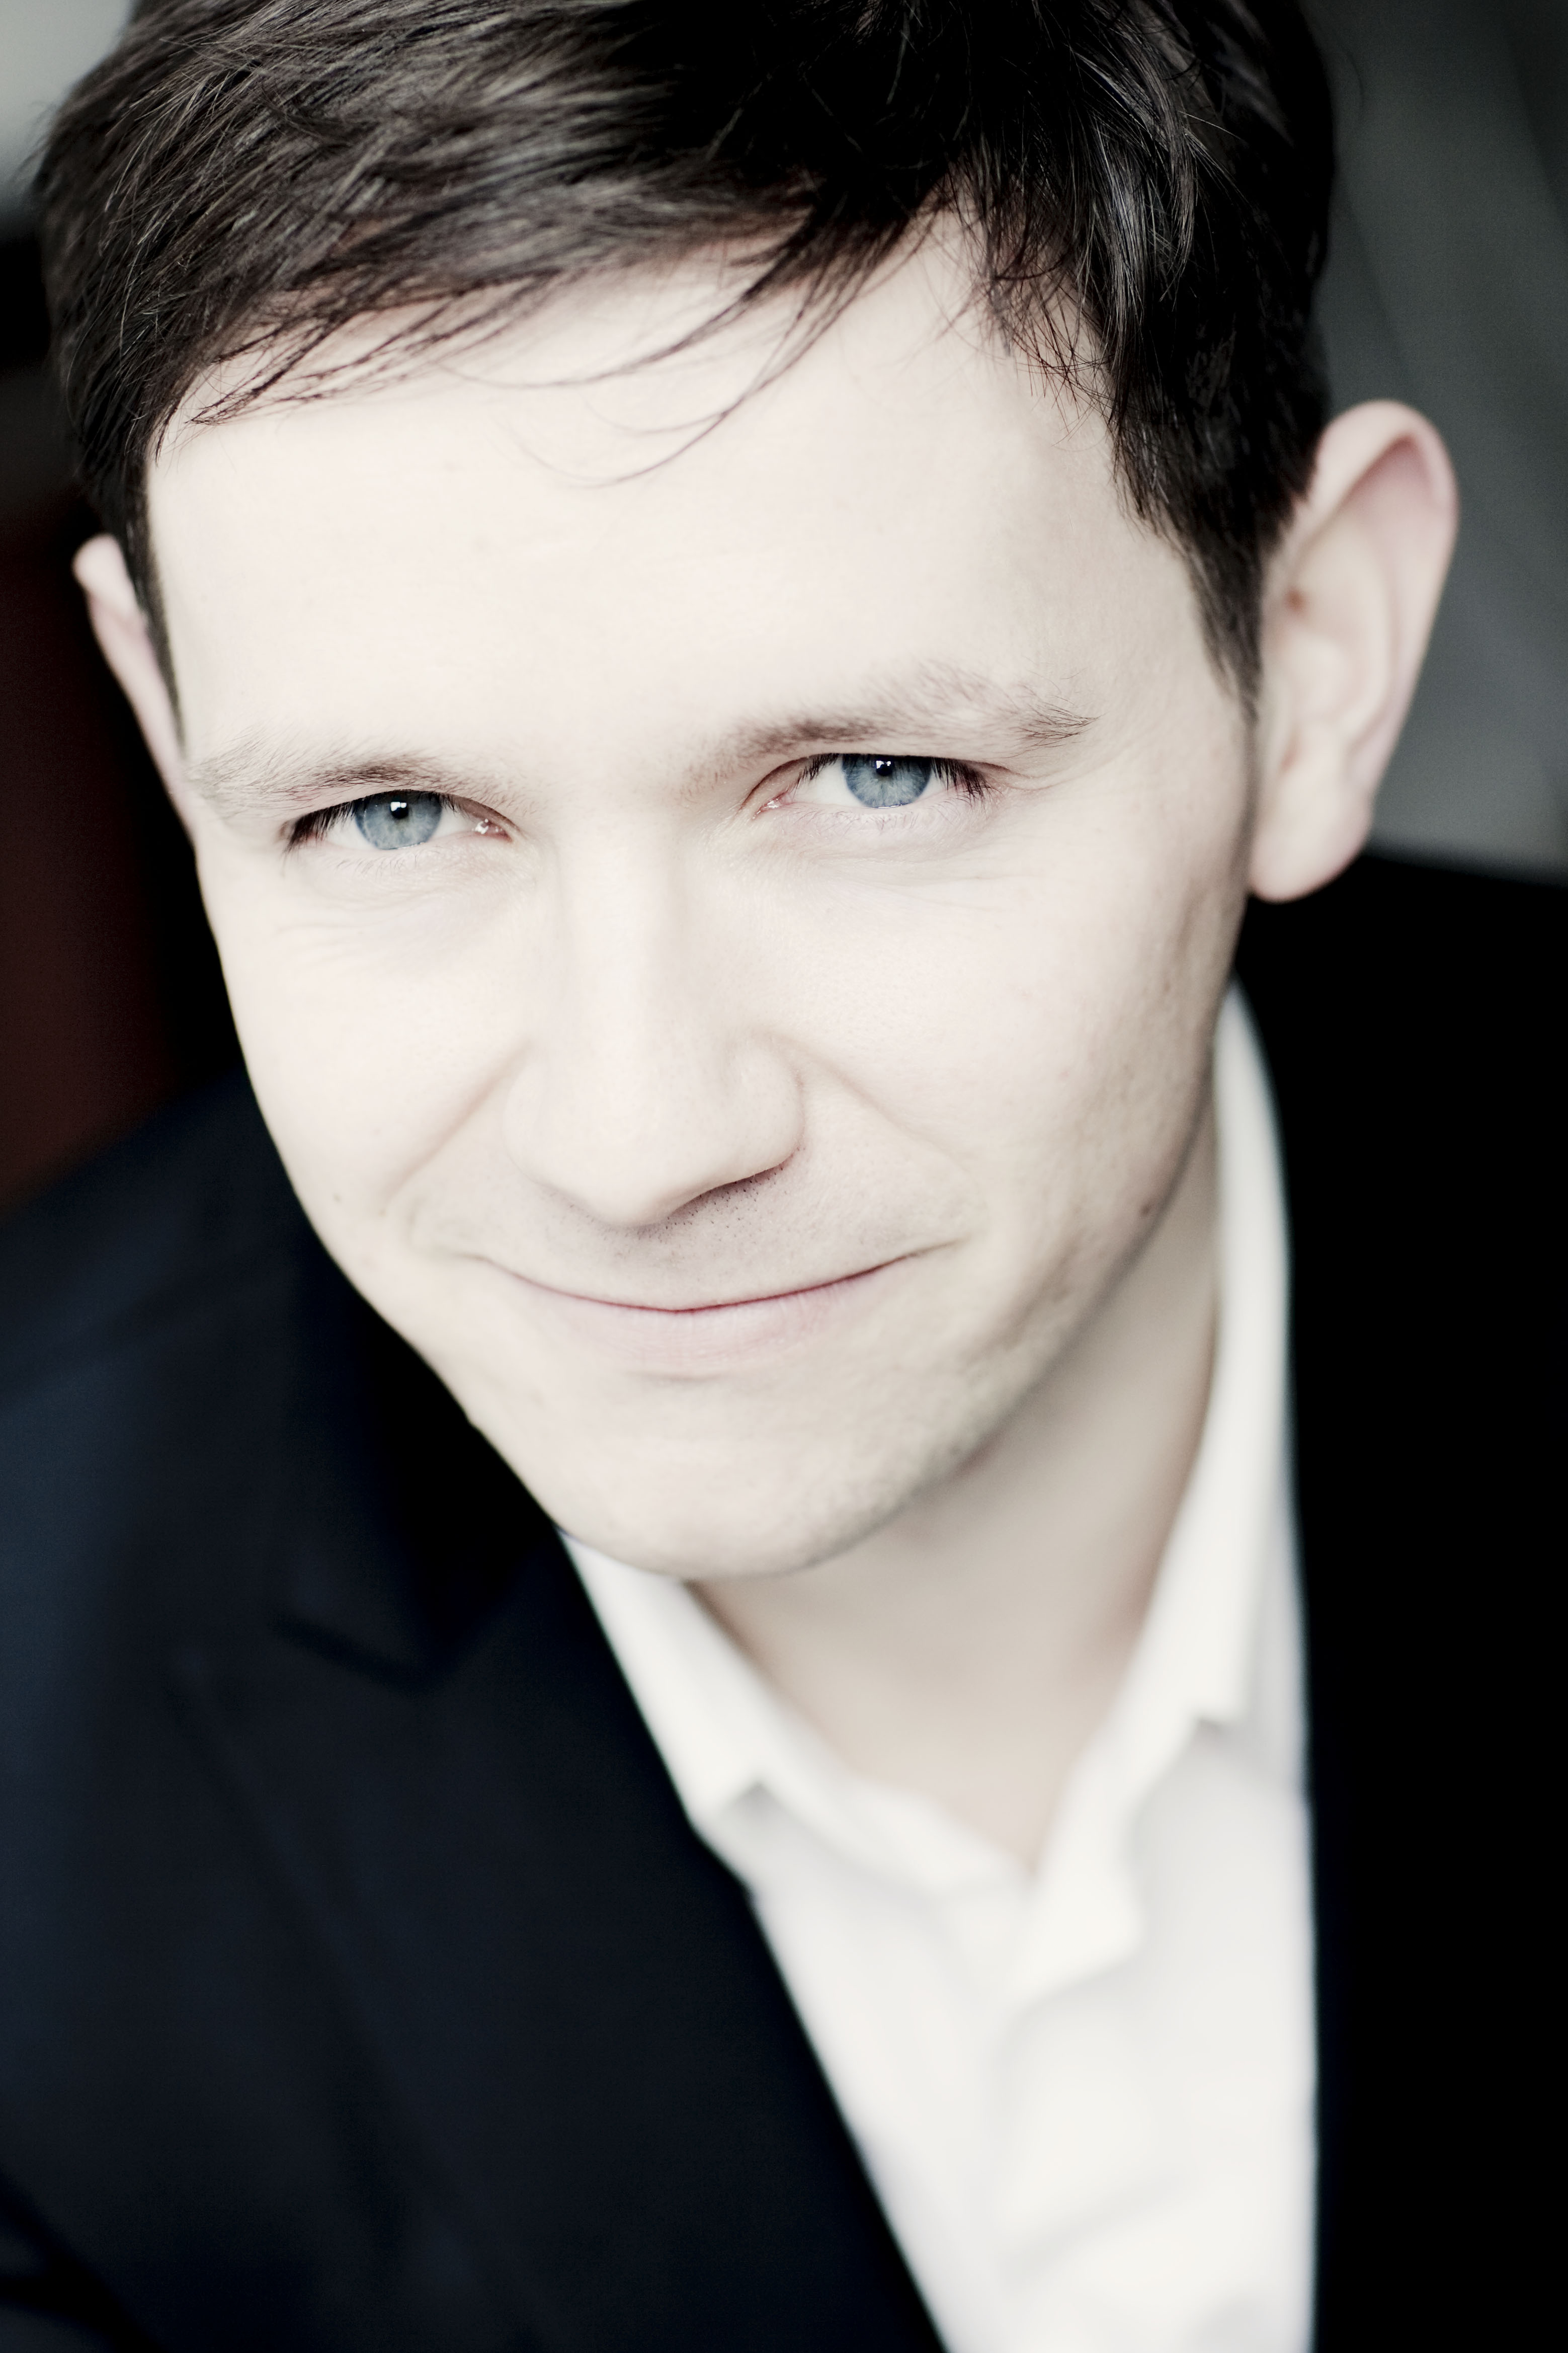 Iestyn Davies Photo: Marco Borggreve